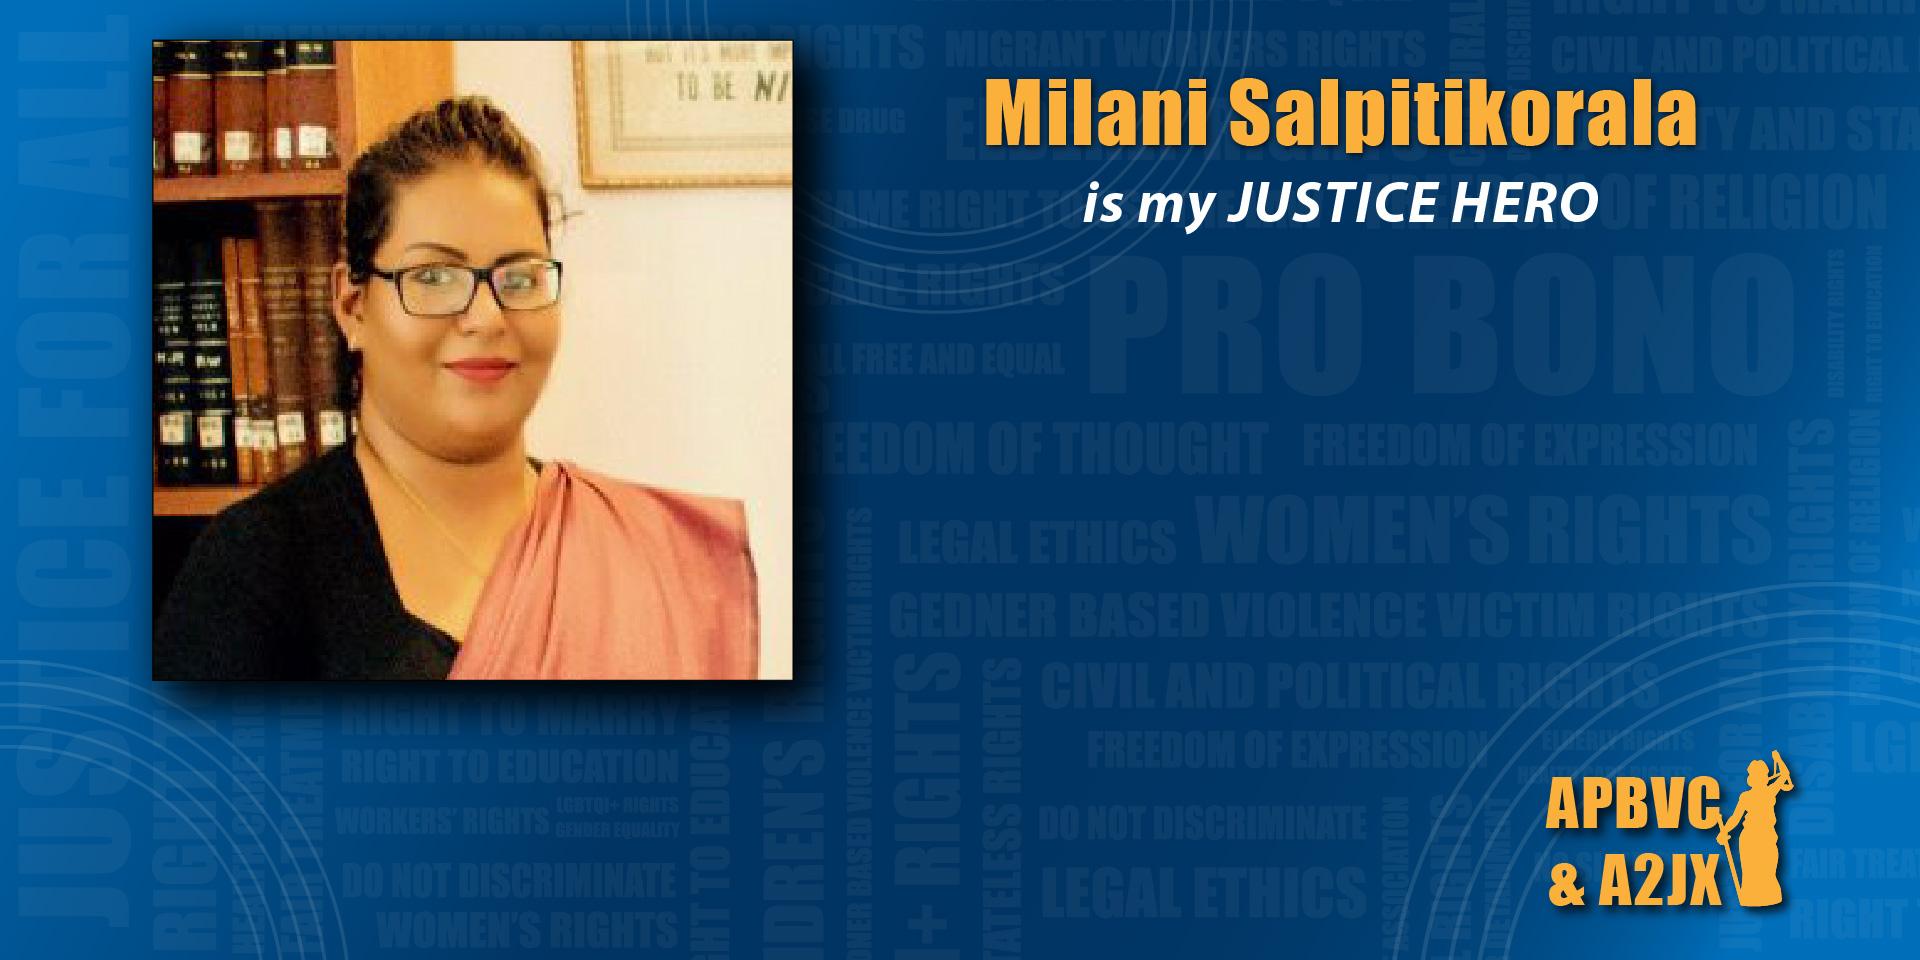 Milani Salpitikorala